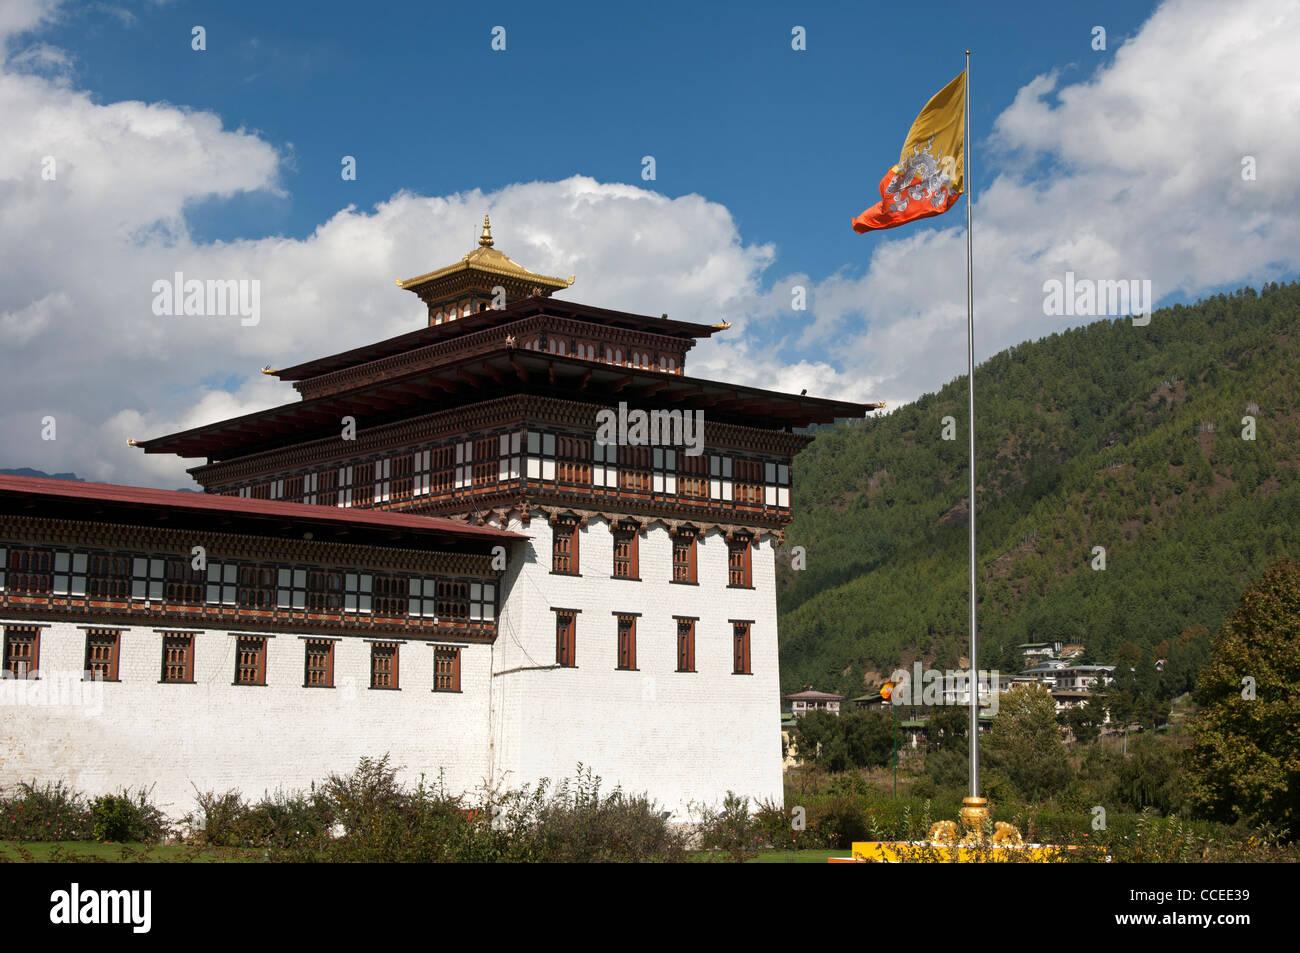 Le drapeau national du Bhoutan s'agite au siège du gouvernement Thimphu Dzong ou Trashichhoe Dzong, Thimphu, Photo Stock